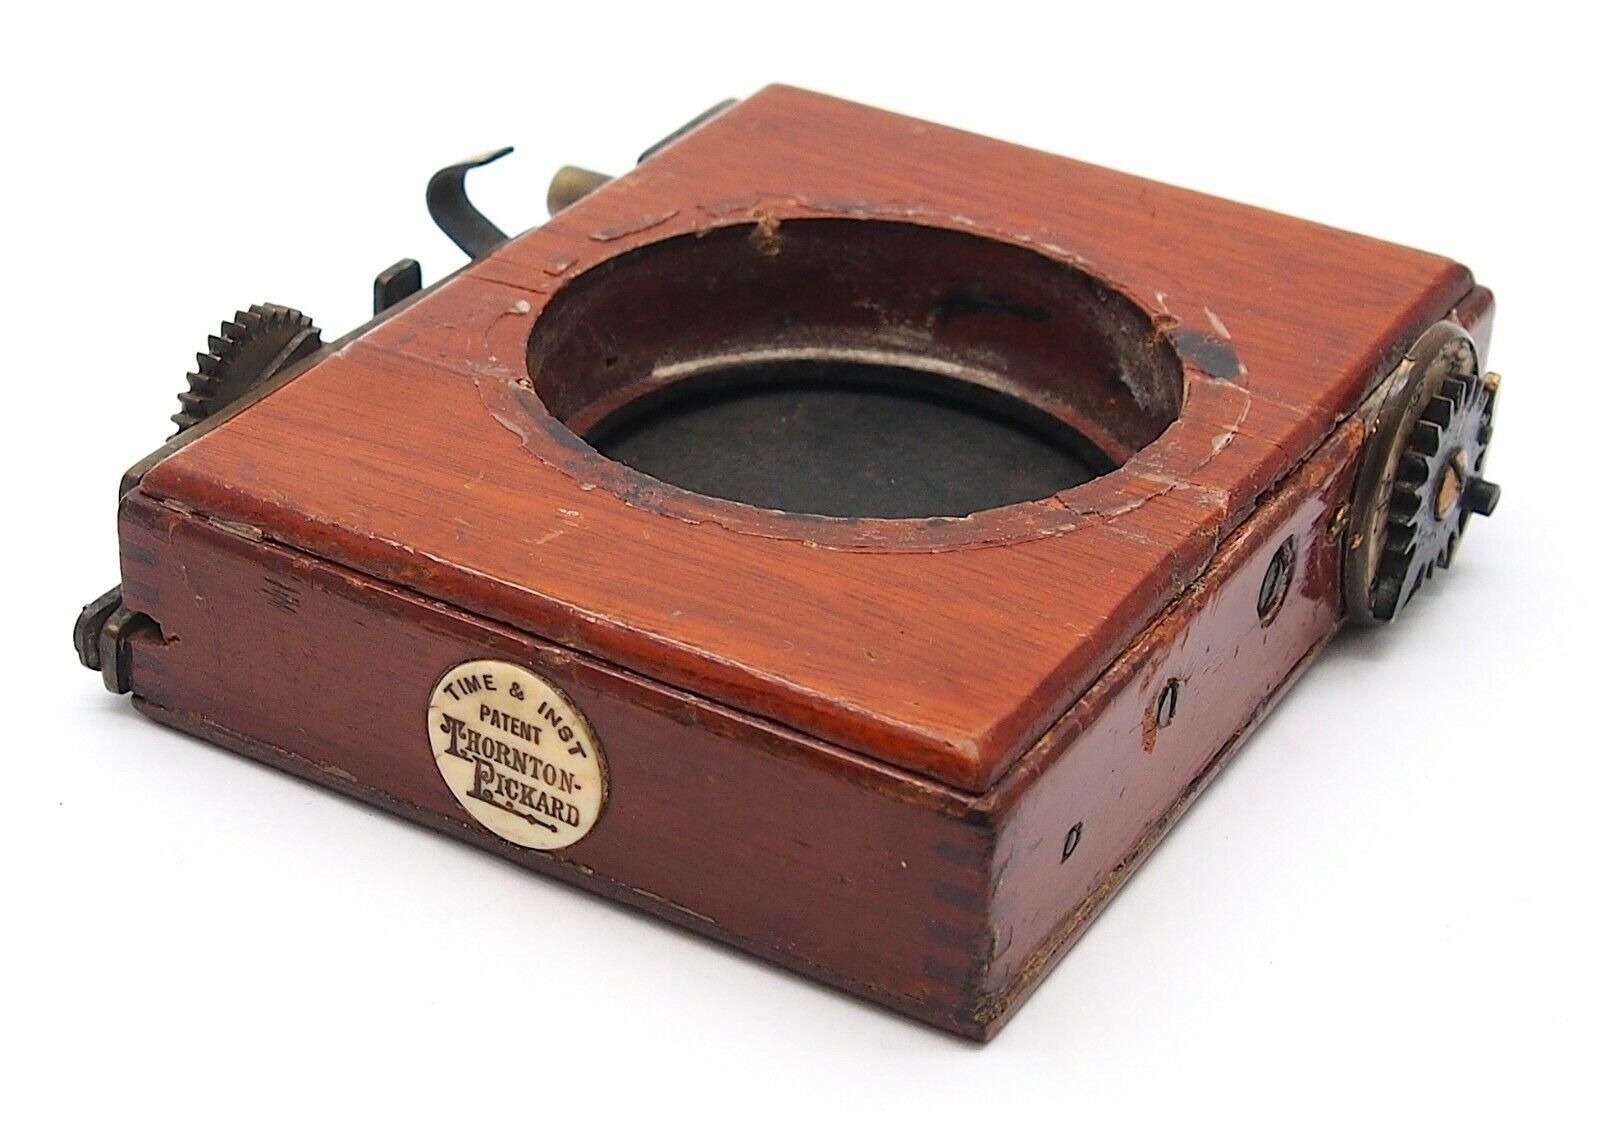 Antique Thornton Pickard Shutter for Plate Camera (100 x 80mm) - UK Dealer